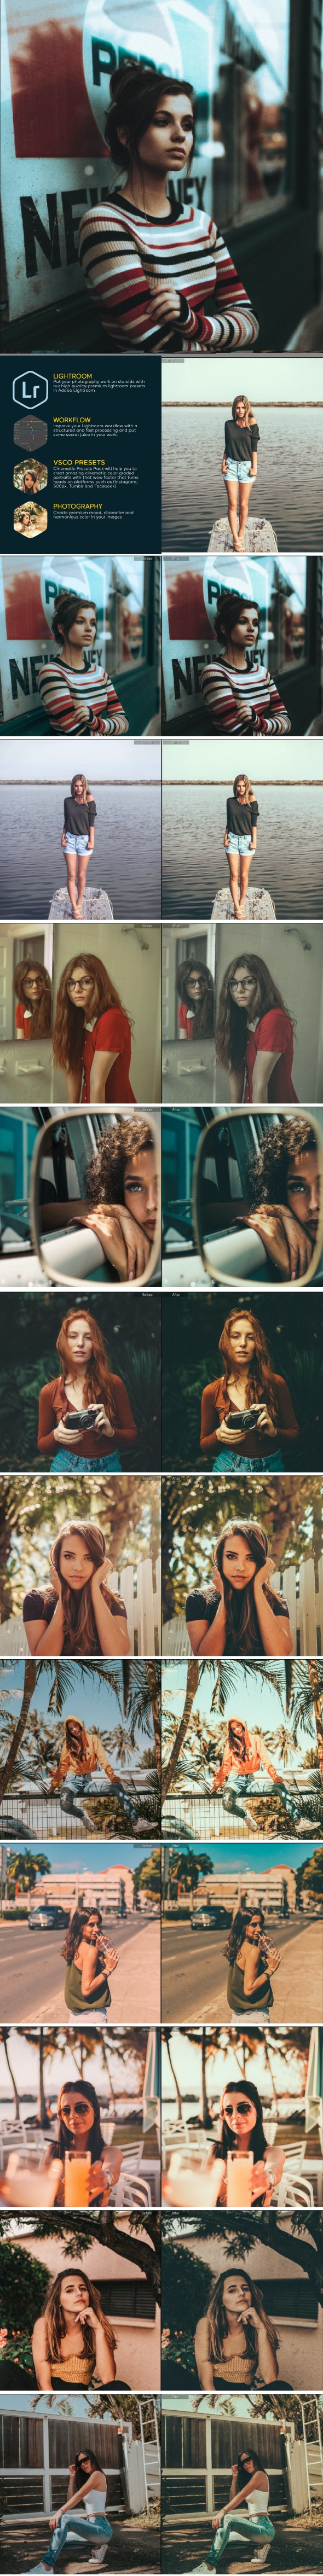 Moody Portrait Presets - Film Lightroom Presets